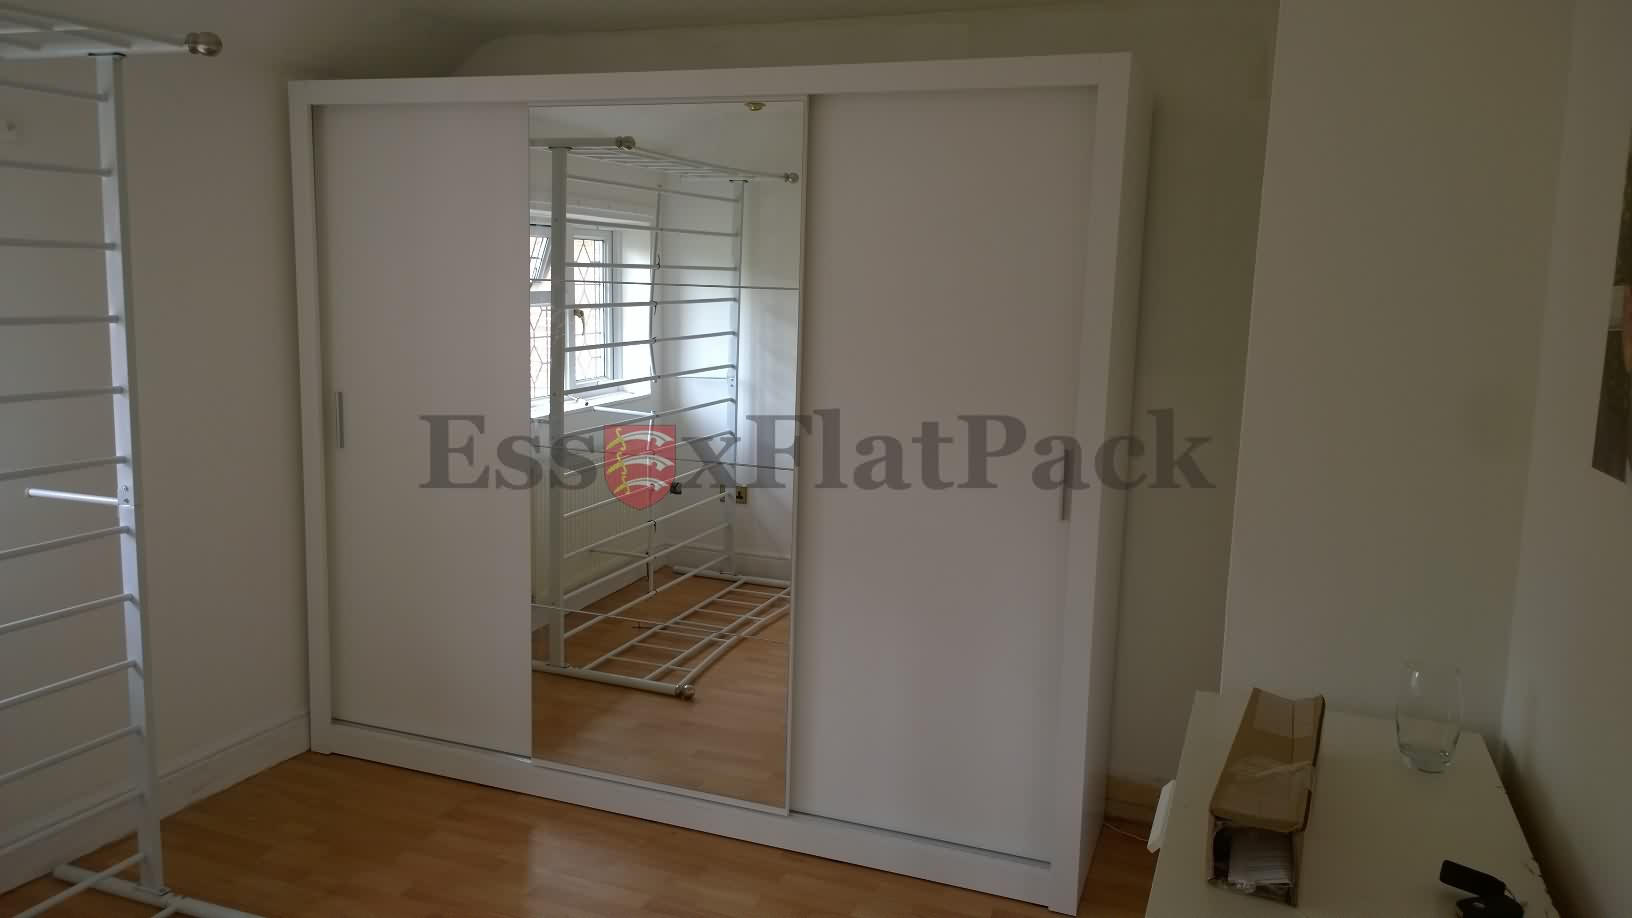 essexflatpack-furniture-20160820163326.jpg